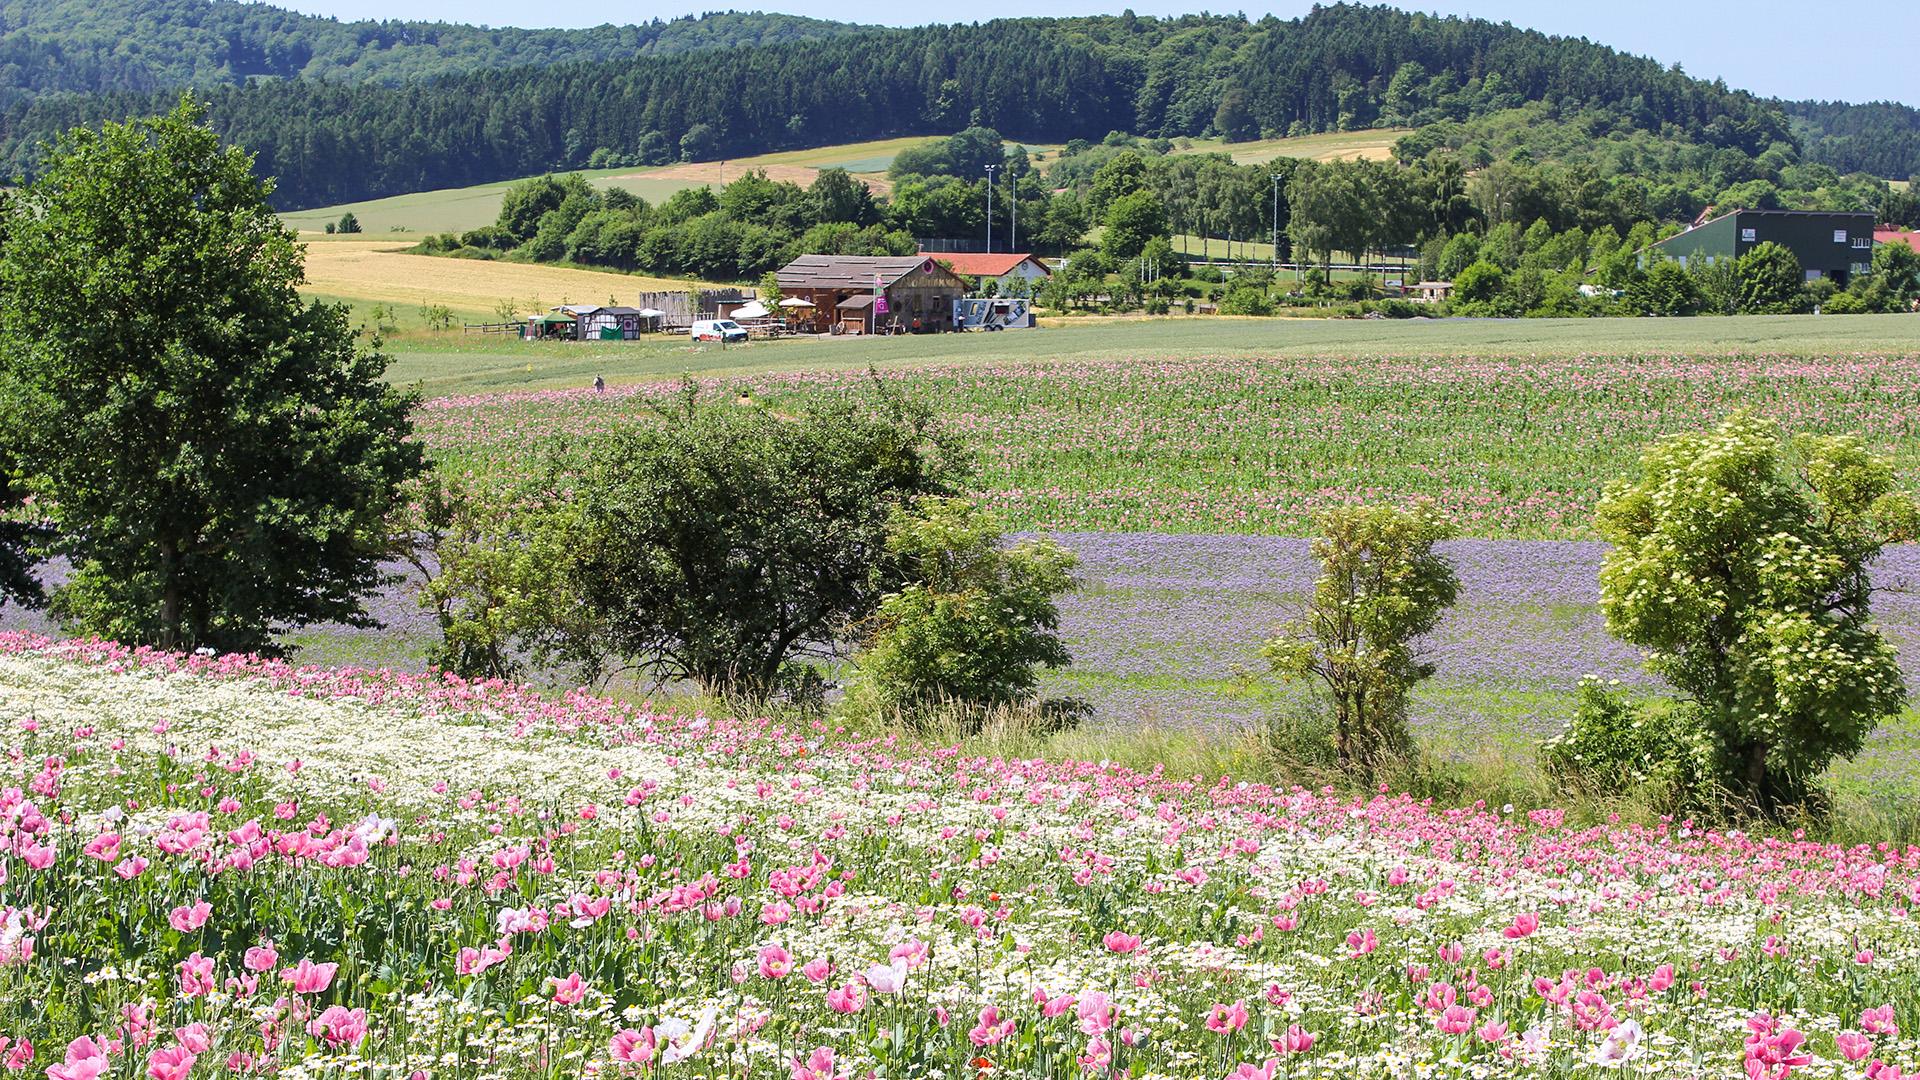 Mohnblüte am Hohen Meißner in Germerode